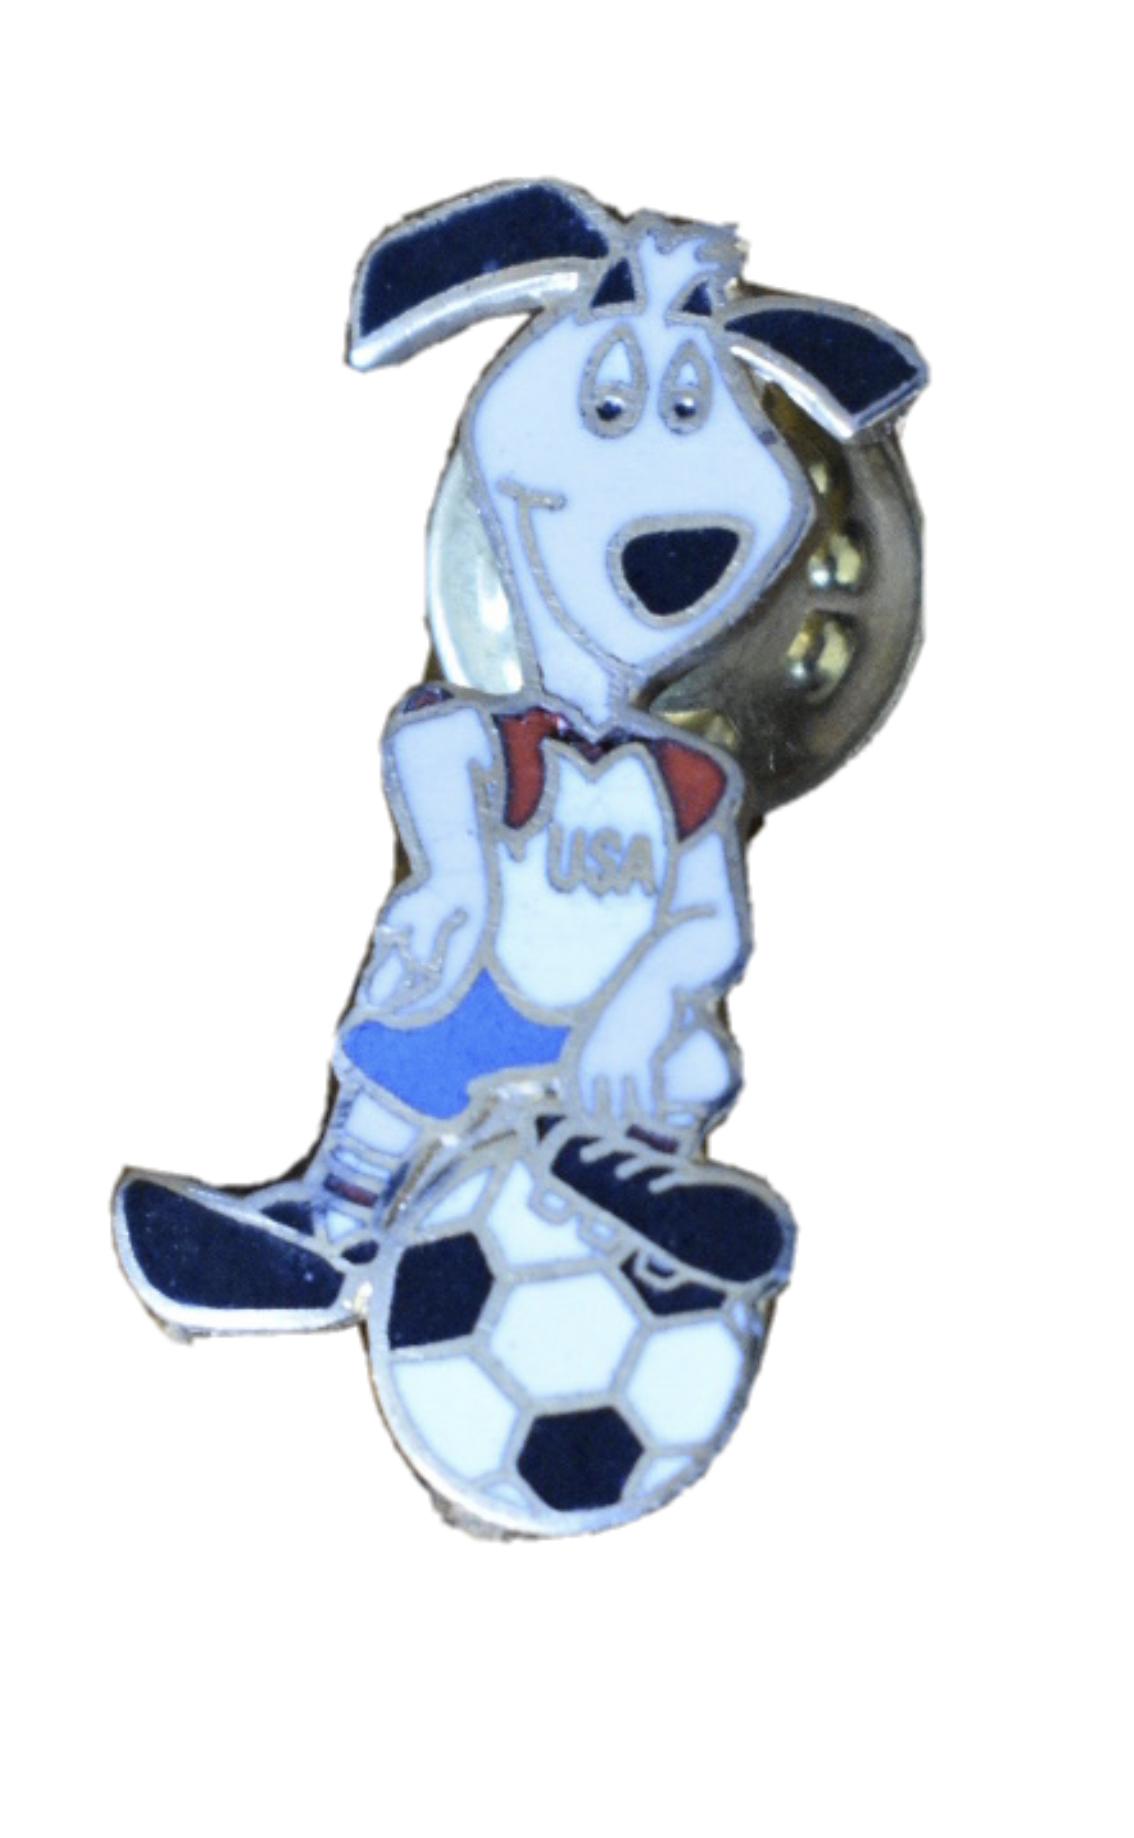 Striker World Cup Pup Mascot Pin 1994